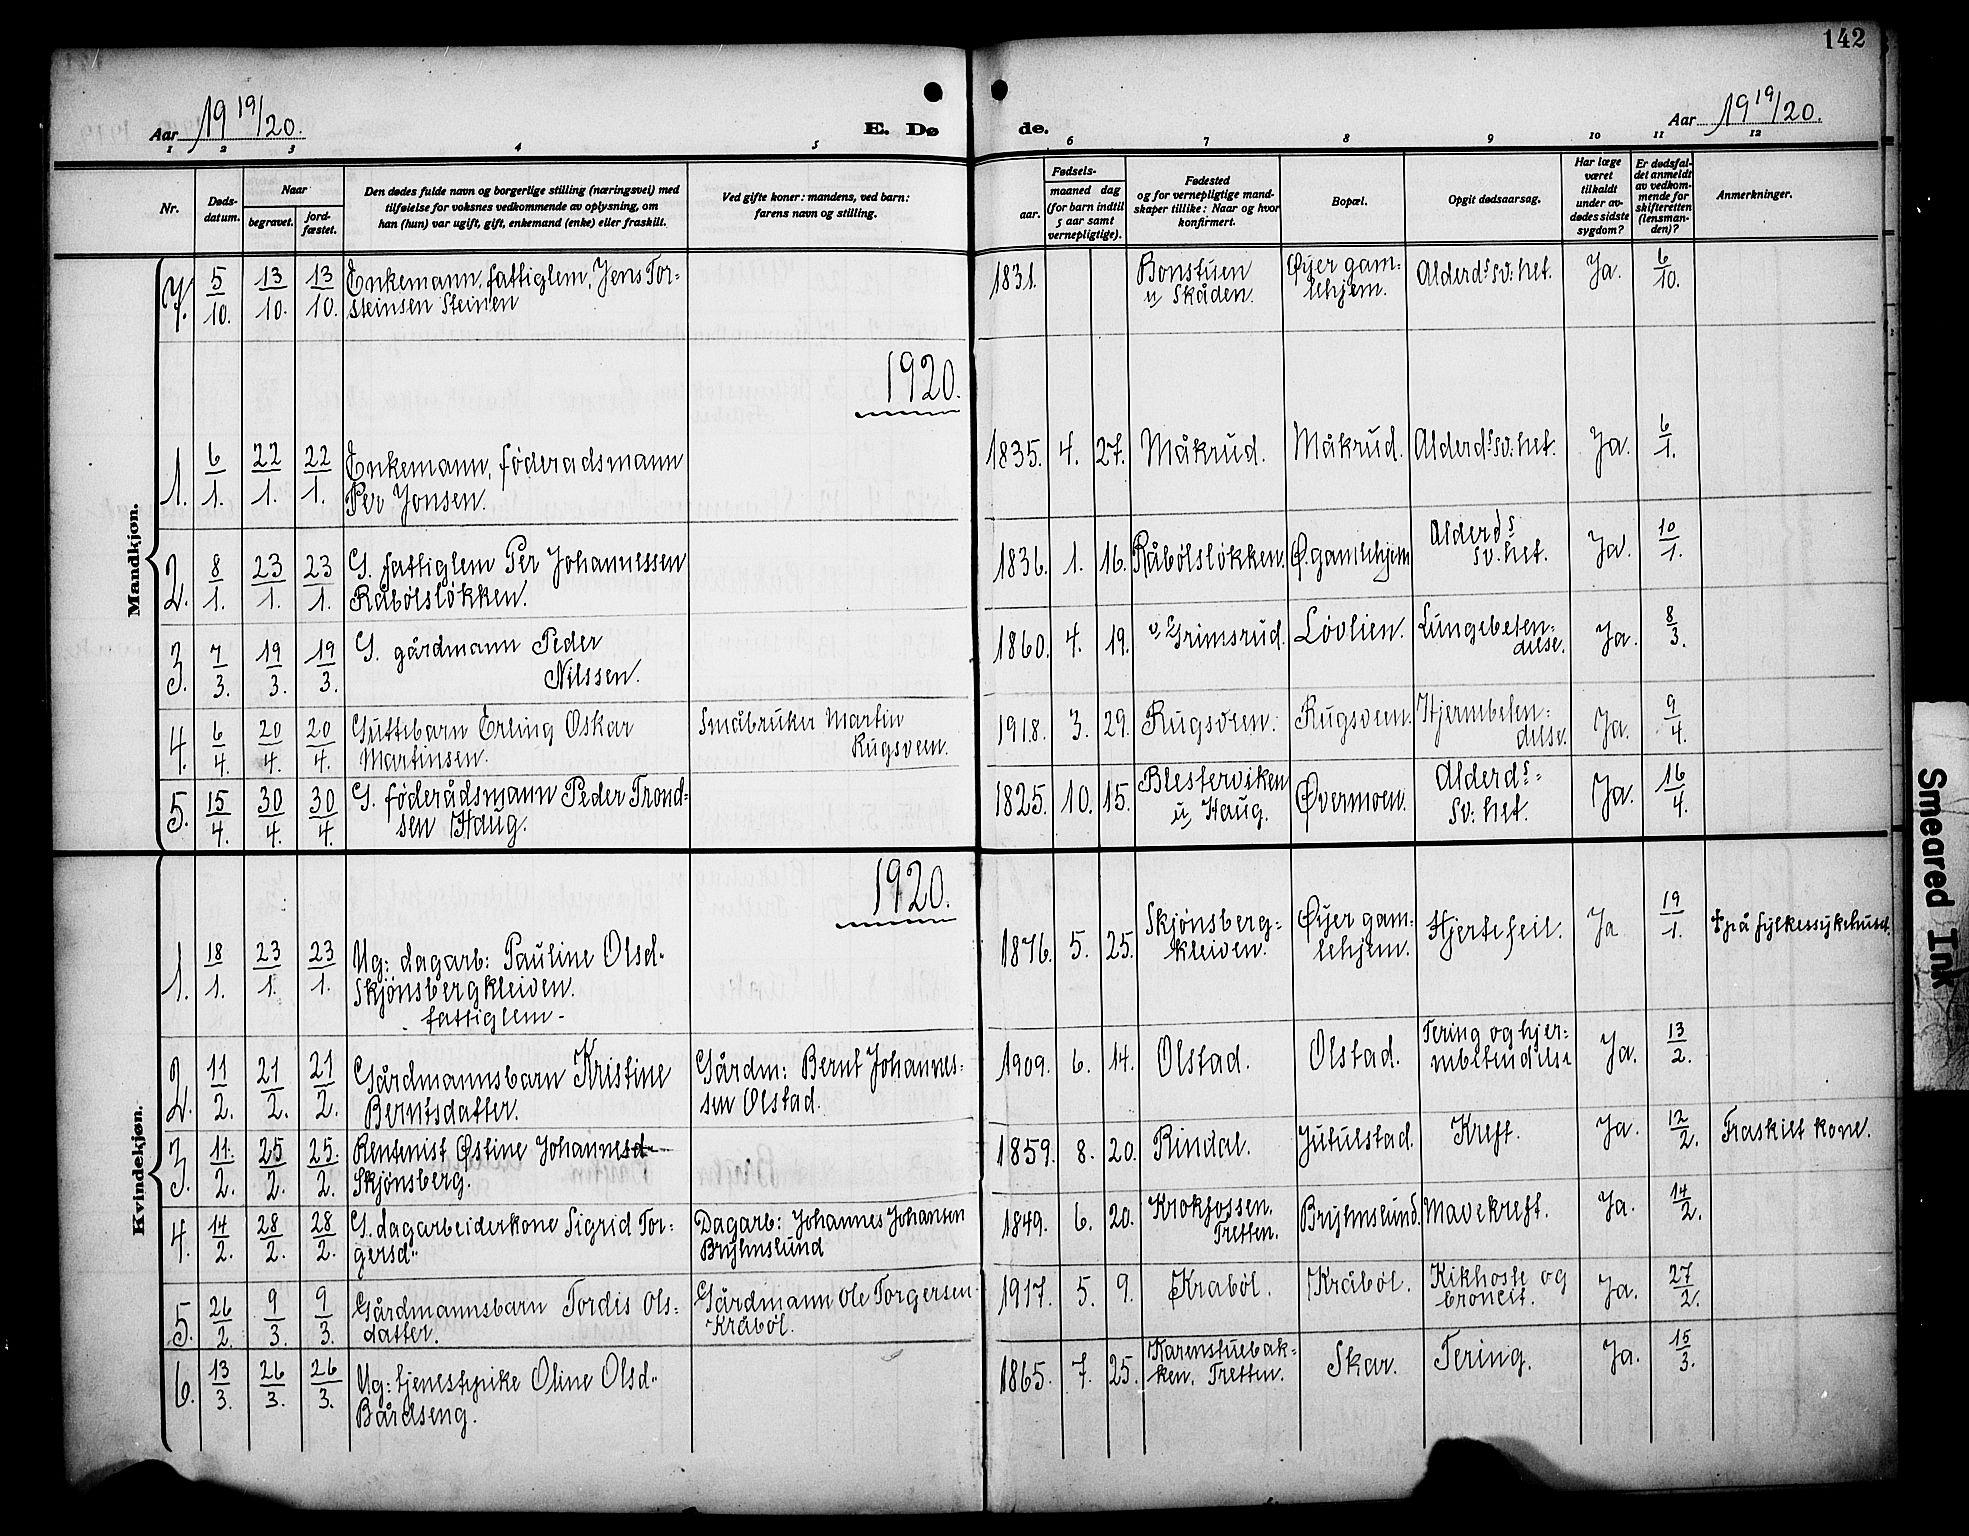 SAH, Øyer prestekontor, Klokkerbok nr. 7, 1913-1928, s. 142